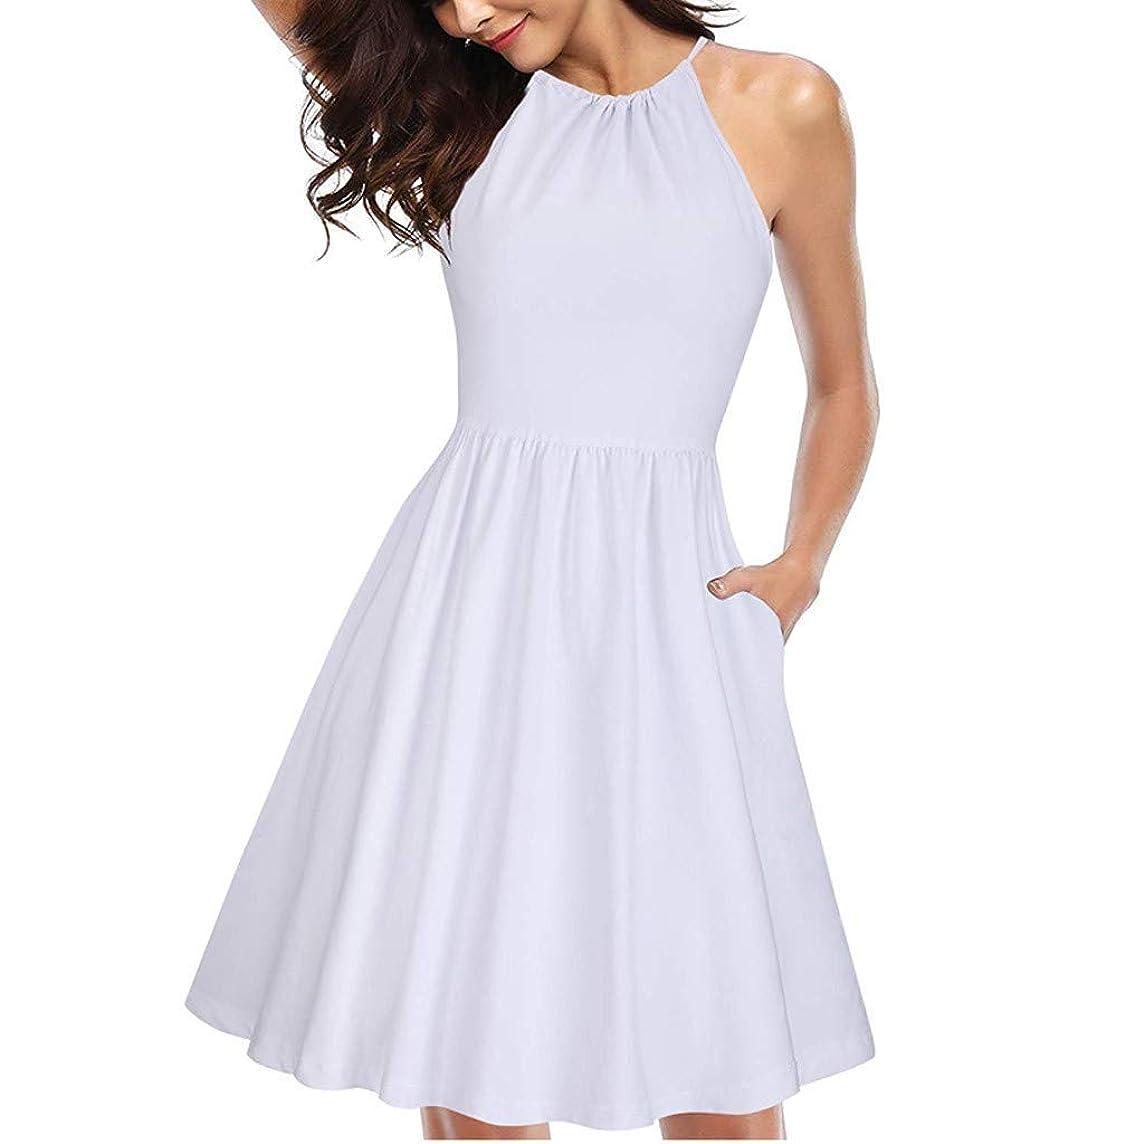 Women Mini Dress Sleeveless High Waist Slim Fit Flare Skater Mini Tank Dress Above Knee Length Short Dress with Pocket